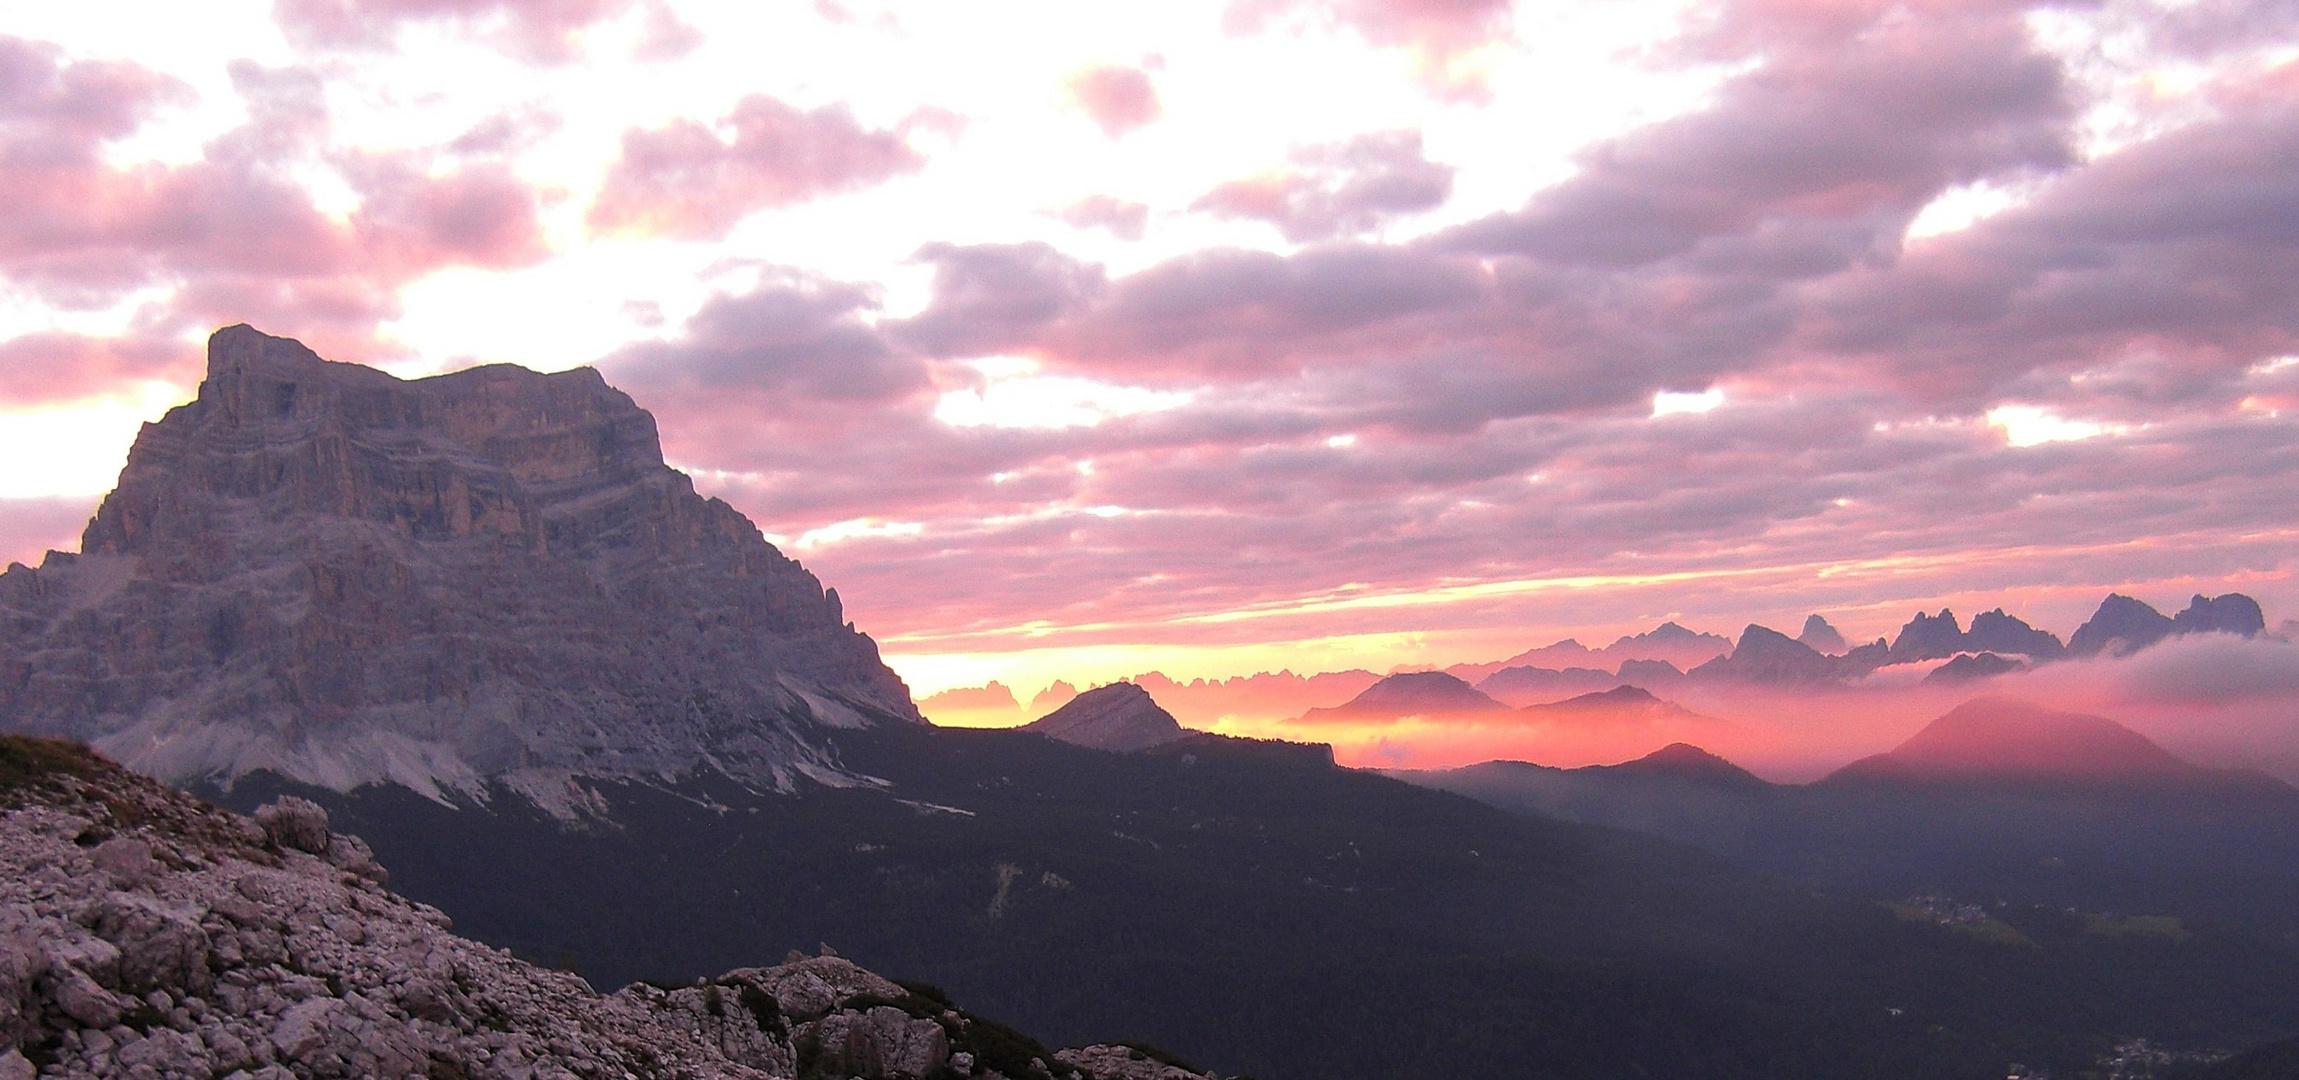 Morgendämmerung am Monte Pelmo